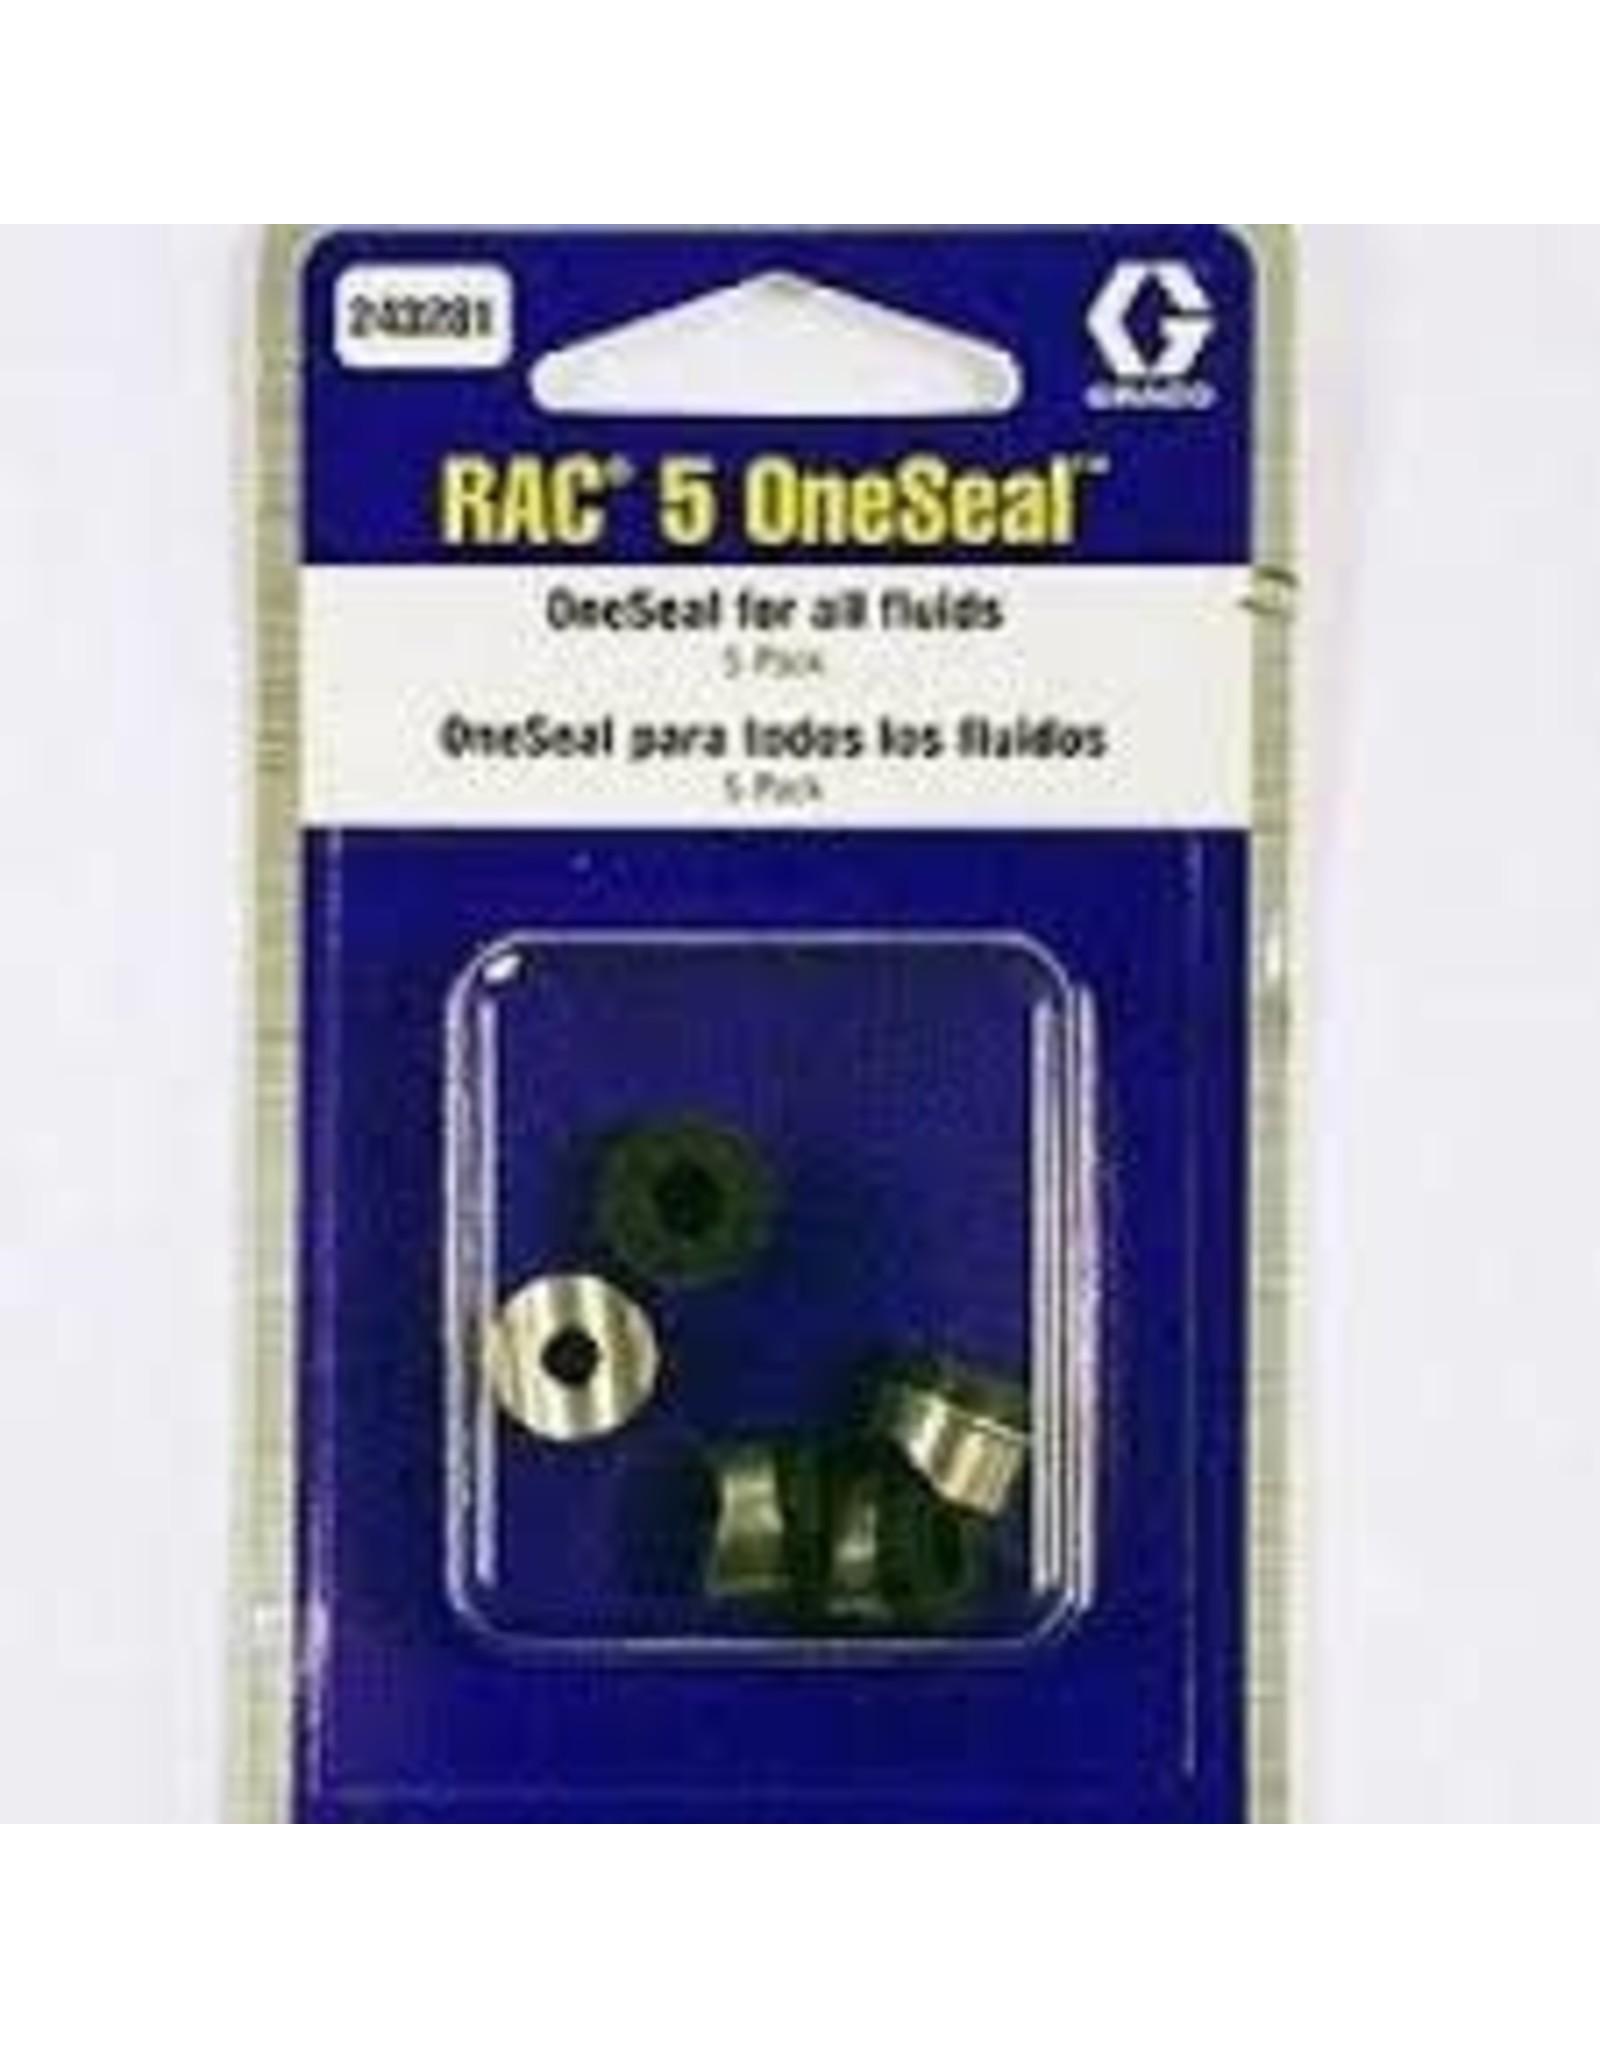 Graco 243281 Rac 5 One Seal 5 Pk